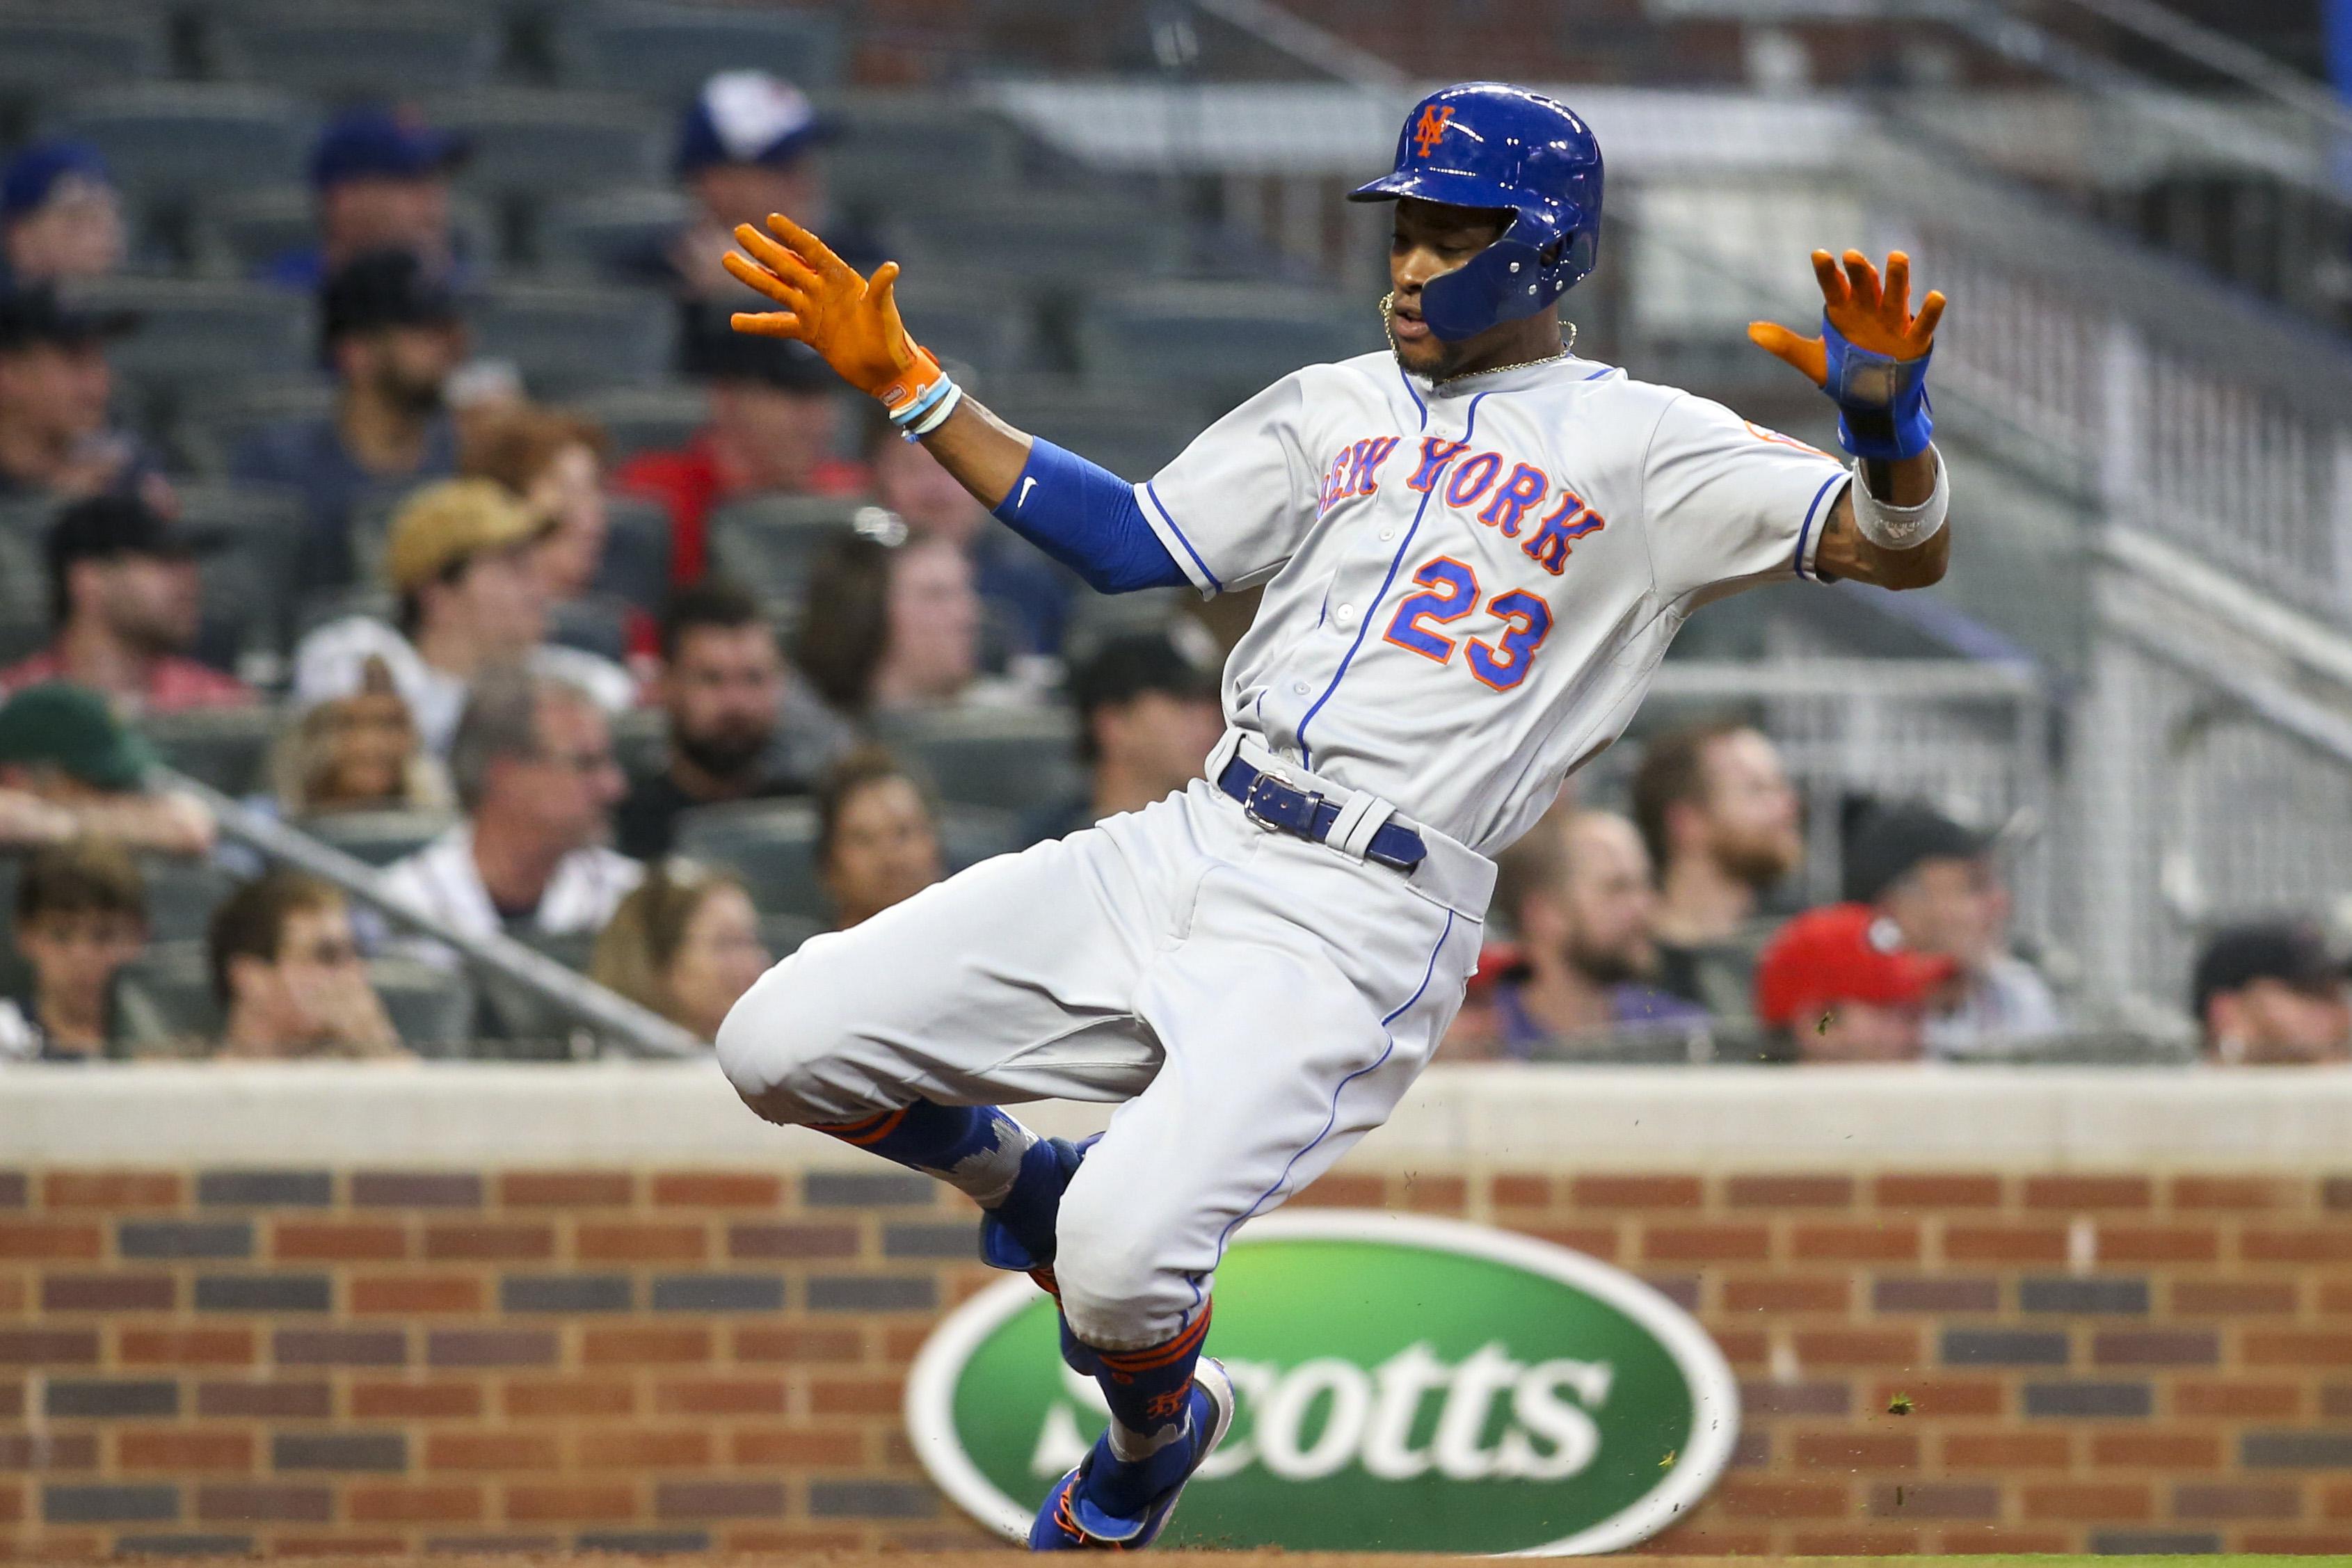 4/14/19 Game Preview: New York Mets at Atlanta Braves